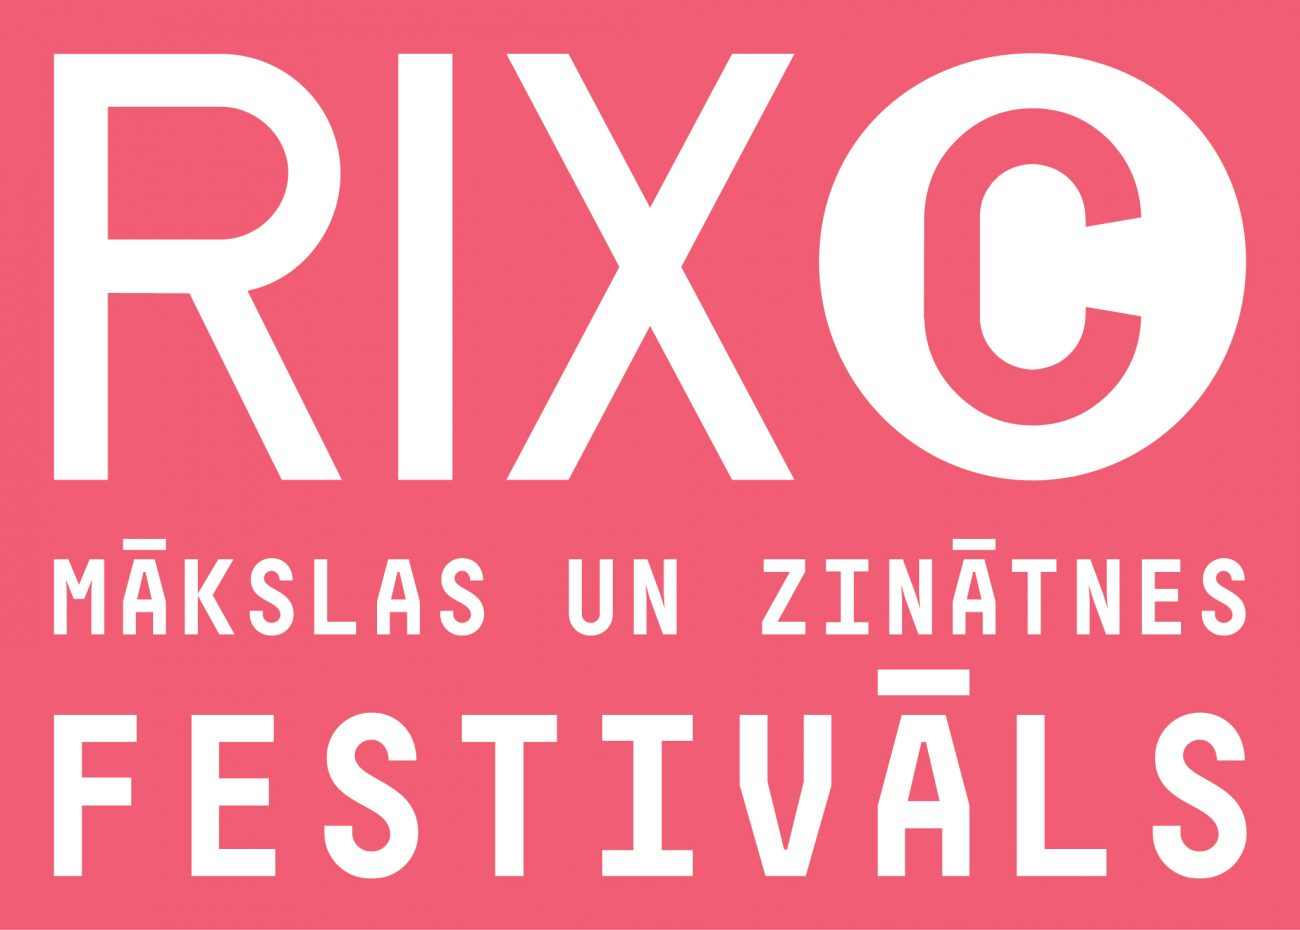 RIXC_makslasunzinatnesfestivals_roza